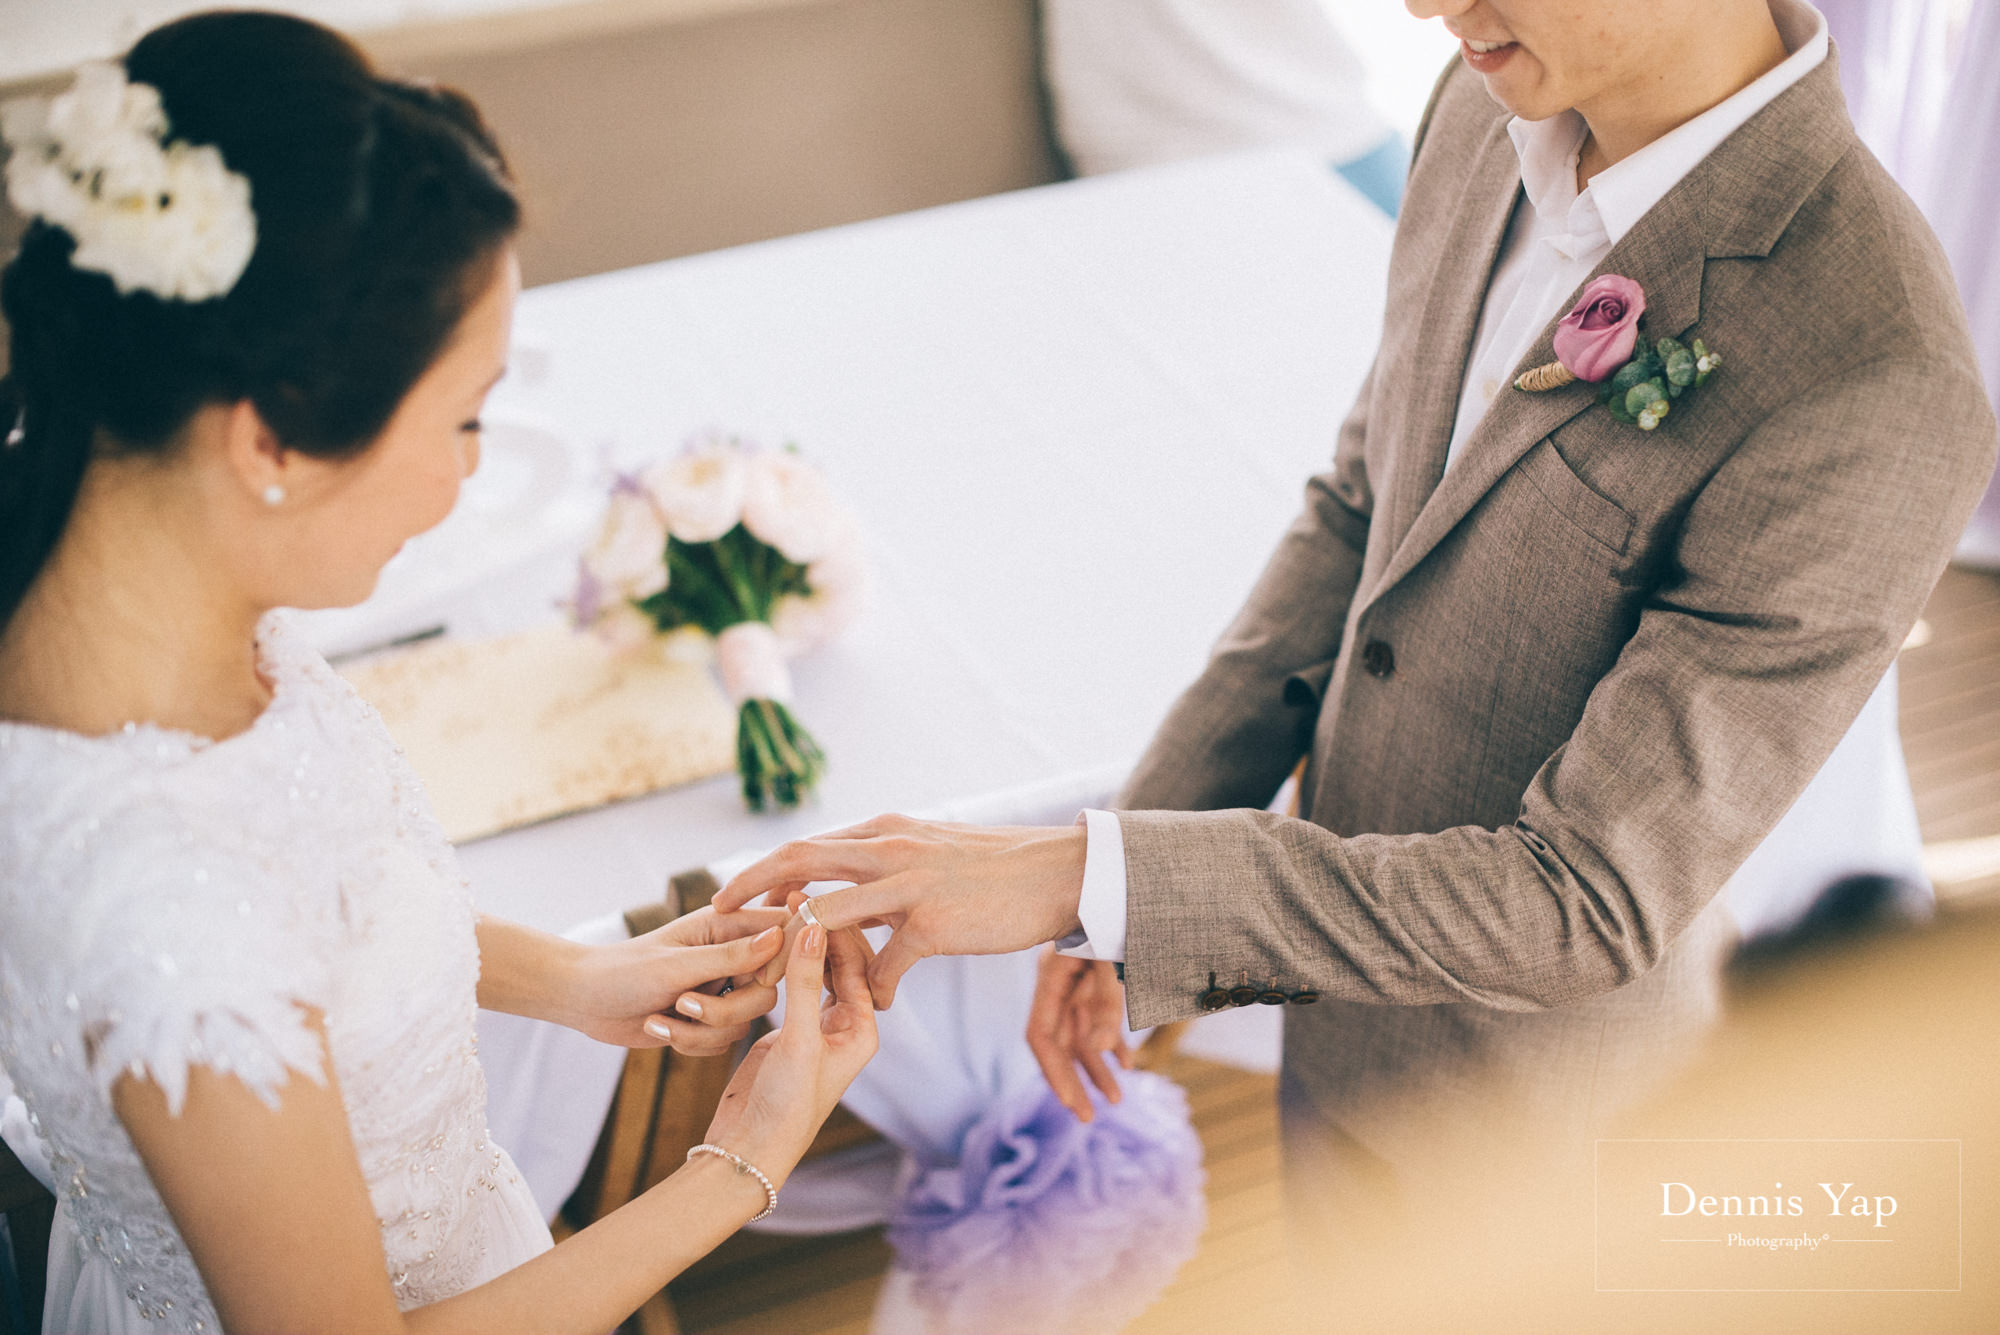 danny sherine wedding reception registration of marriage yacht fun beloved sea dennis yap photography malaysia top wedding photographer-20.jpg